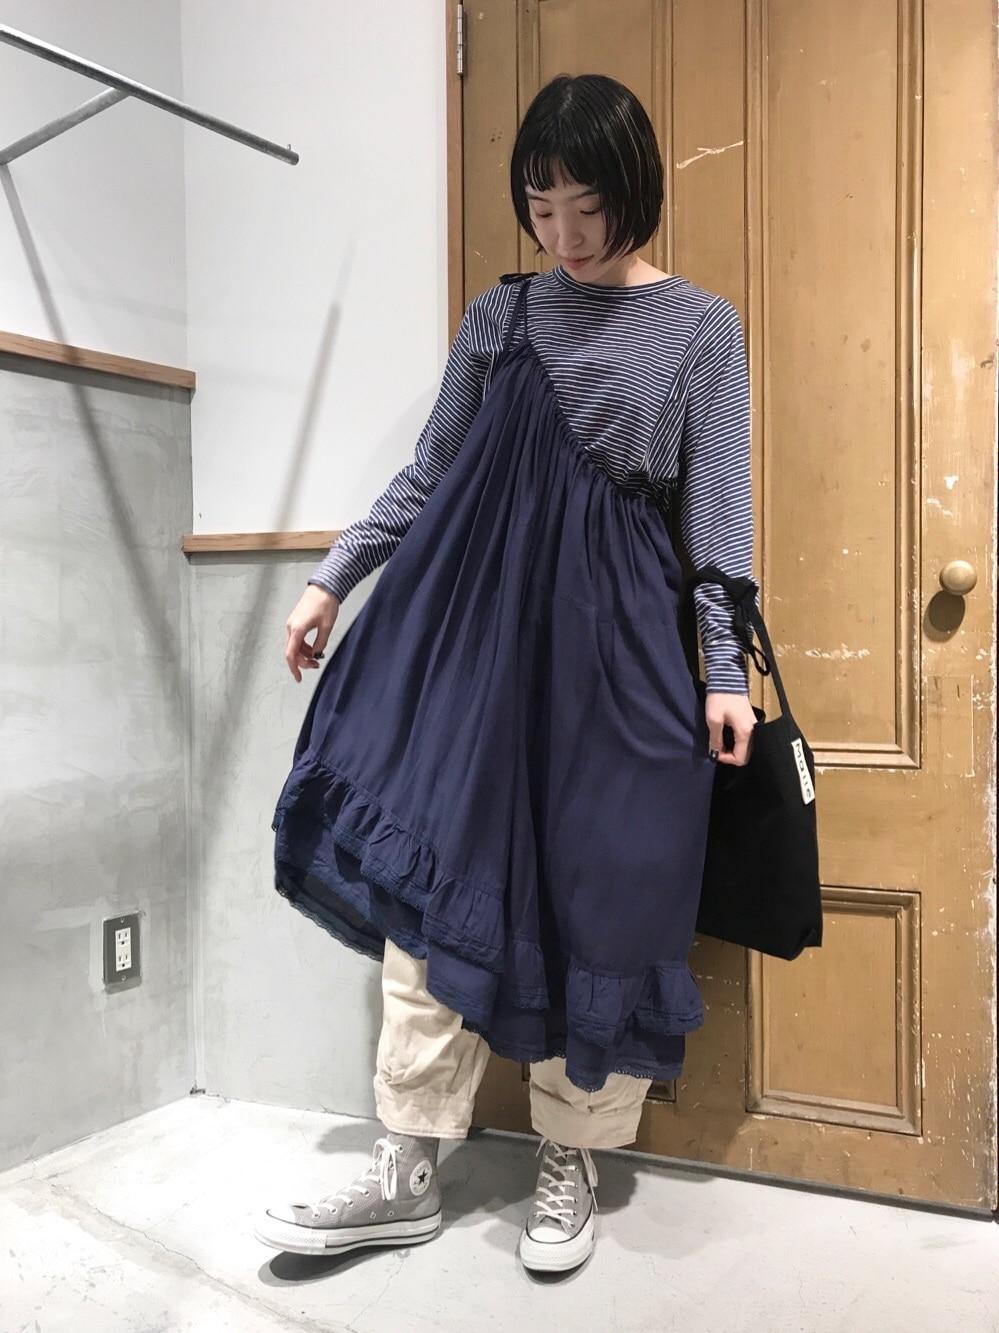 Malle chambre de charme ルミネ新宿 身長:164cm 2020.10.24